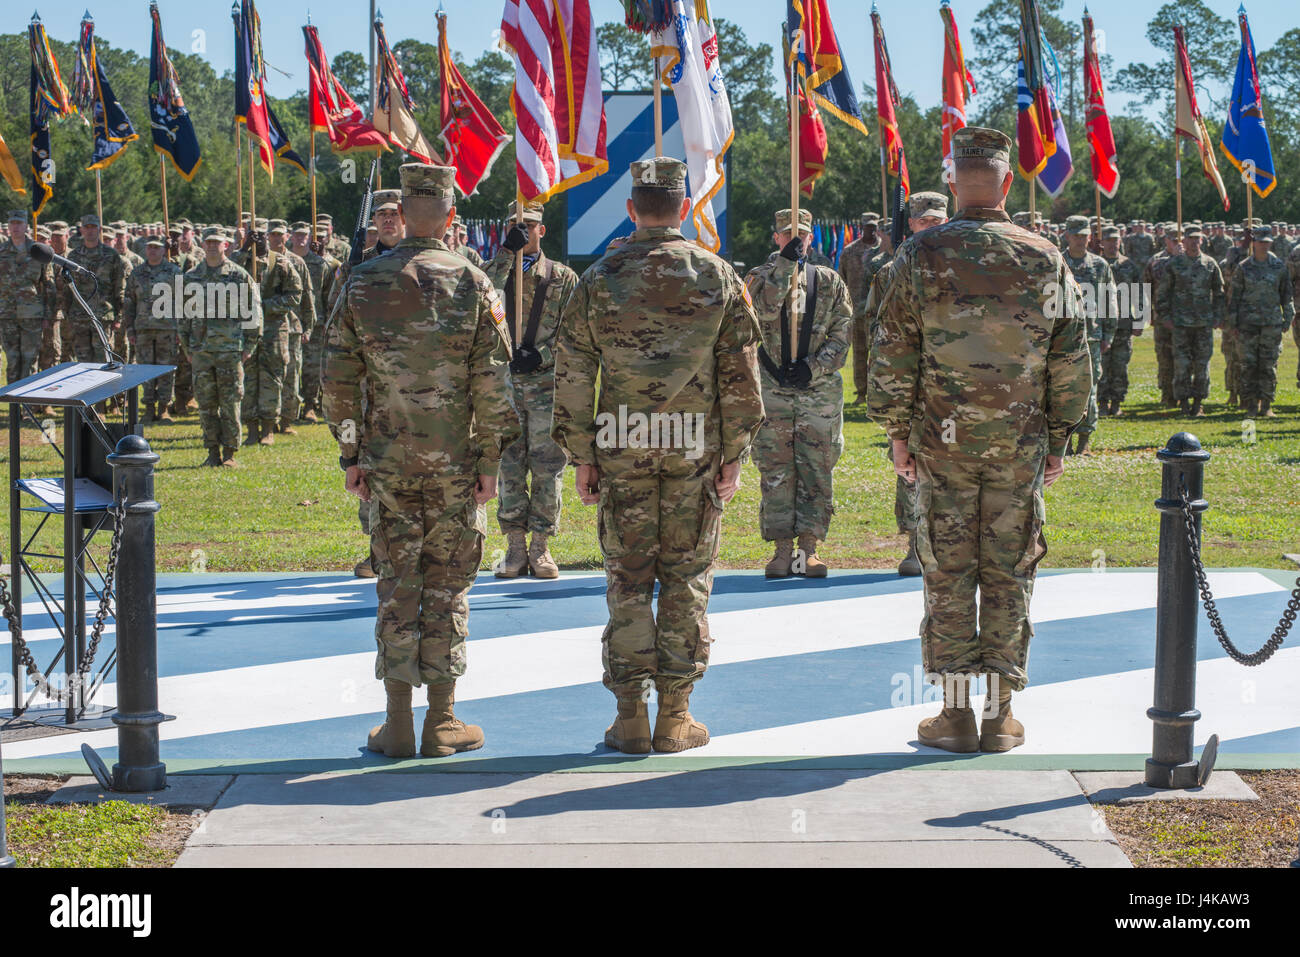 Maj. Gen. Leopoldo Quintas, left, incoming Commander of 3rd Infantry Division, Gen. Robert Abrams, center, Commander - Stock Image